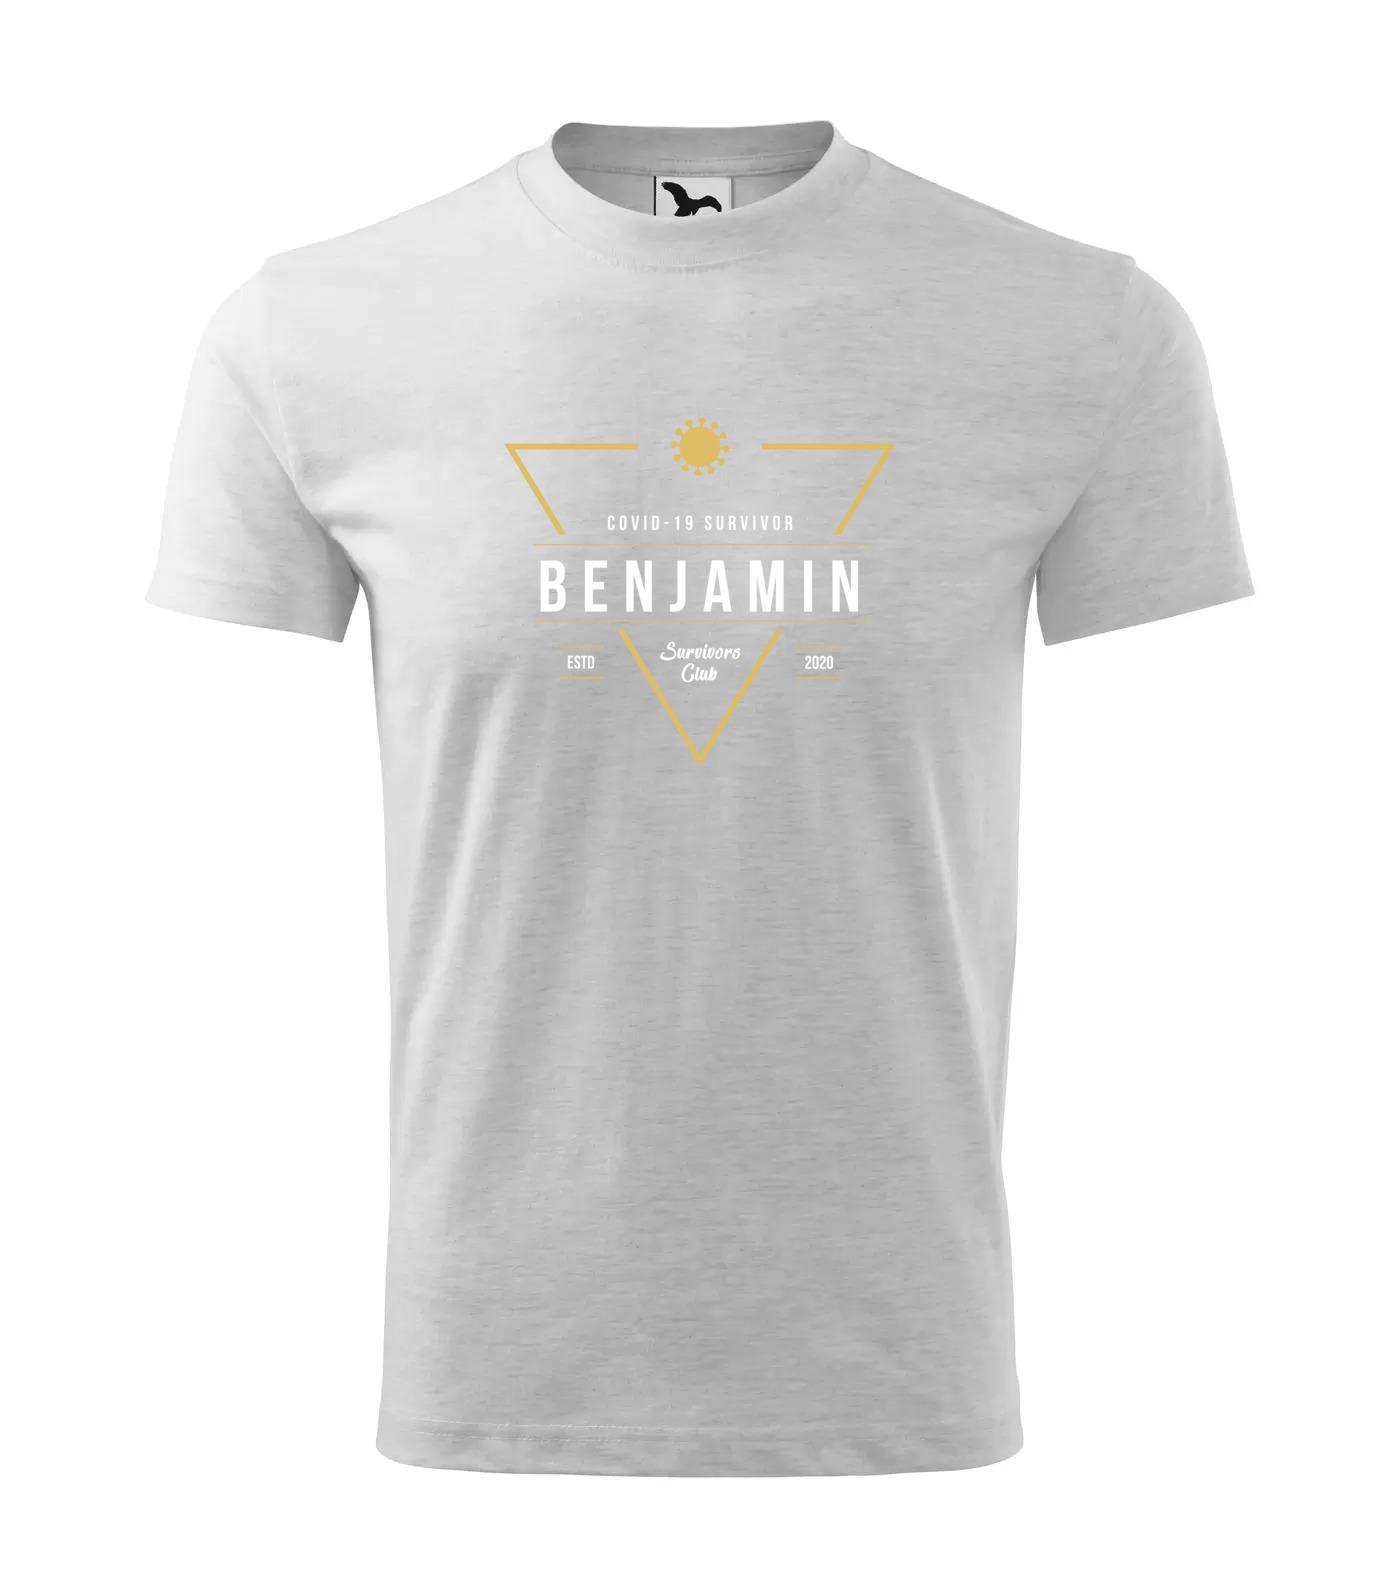 Tričko Survivor Club Benjamin